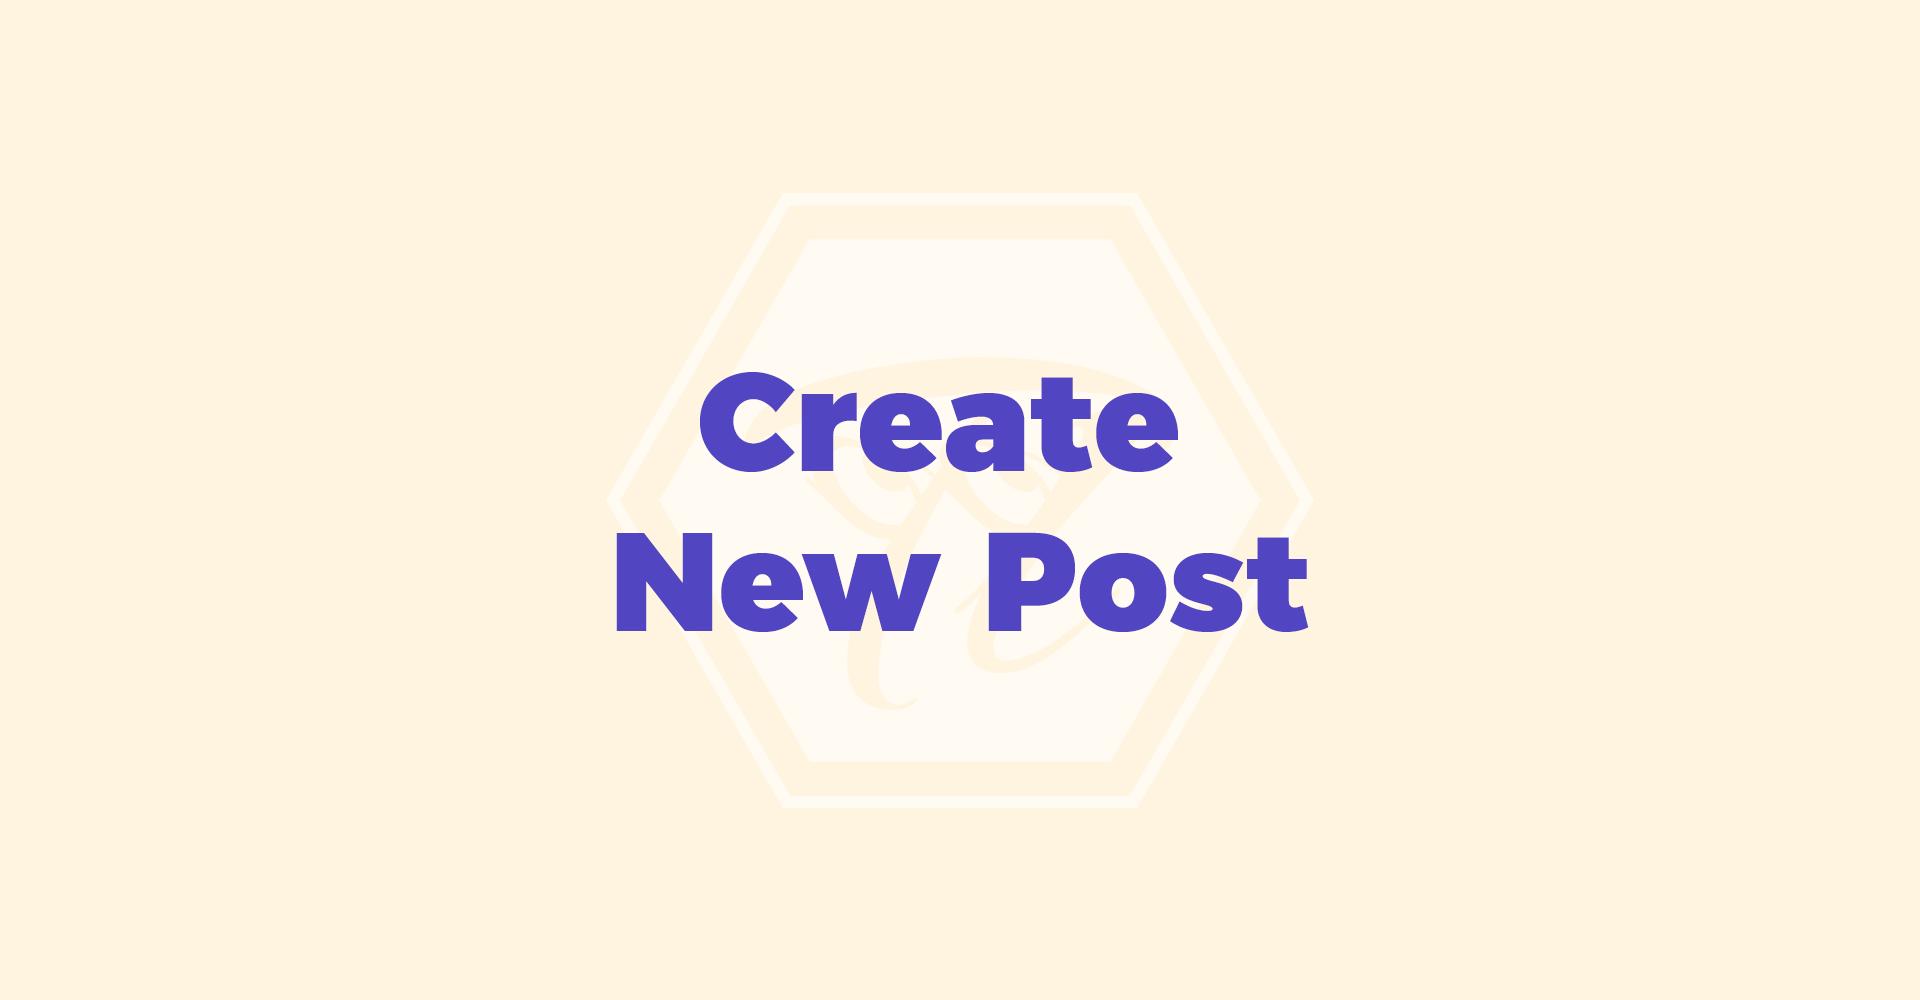 create__new_post 1 1 3